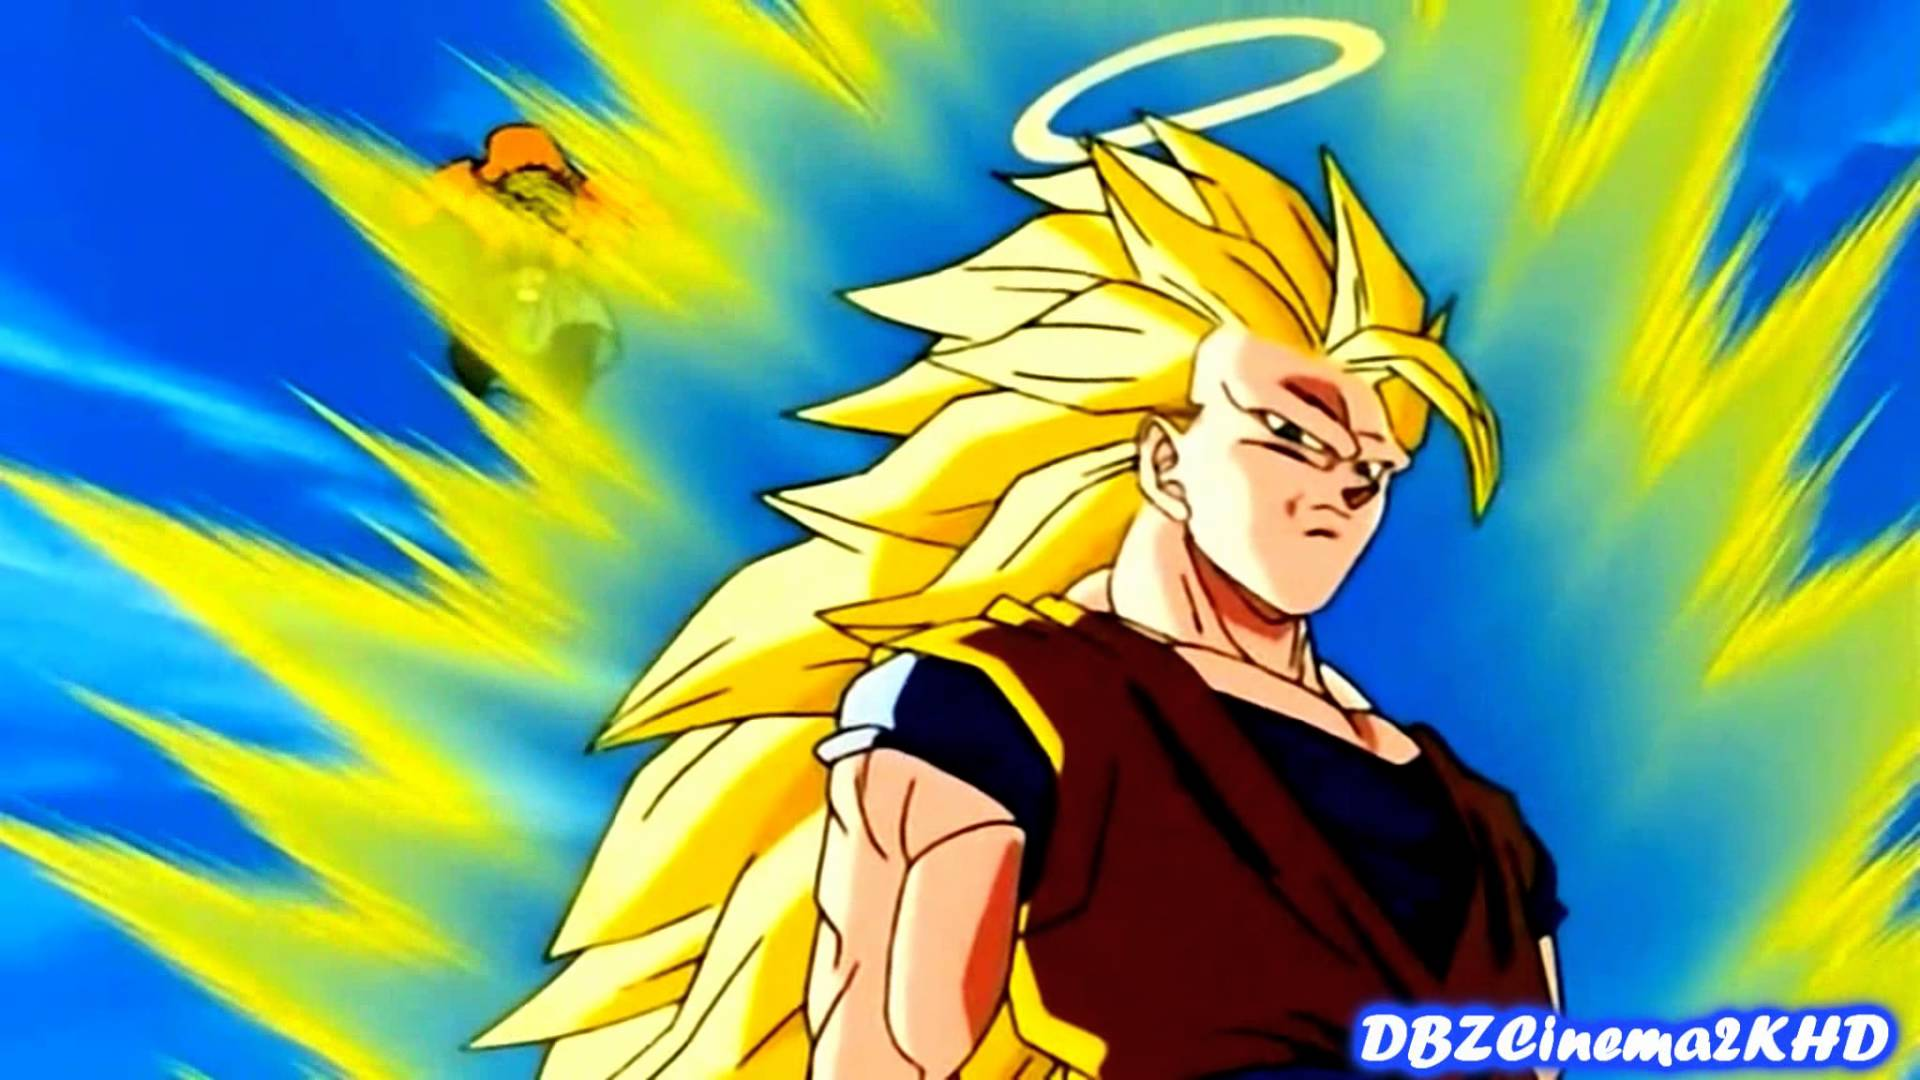 Goku Dragon Ball Z Wallpaper 35368350 Fanpop